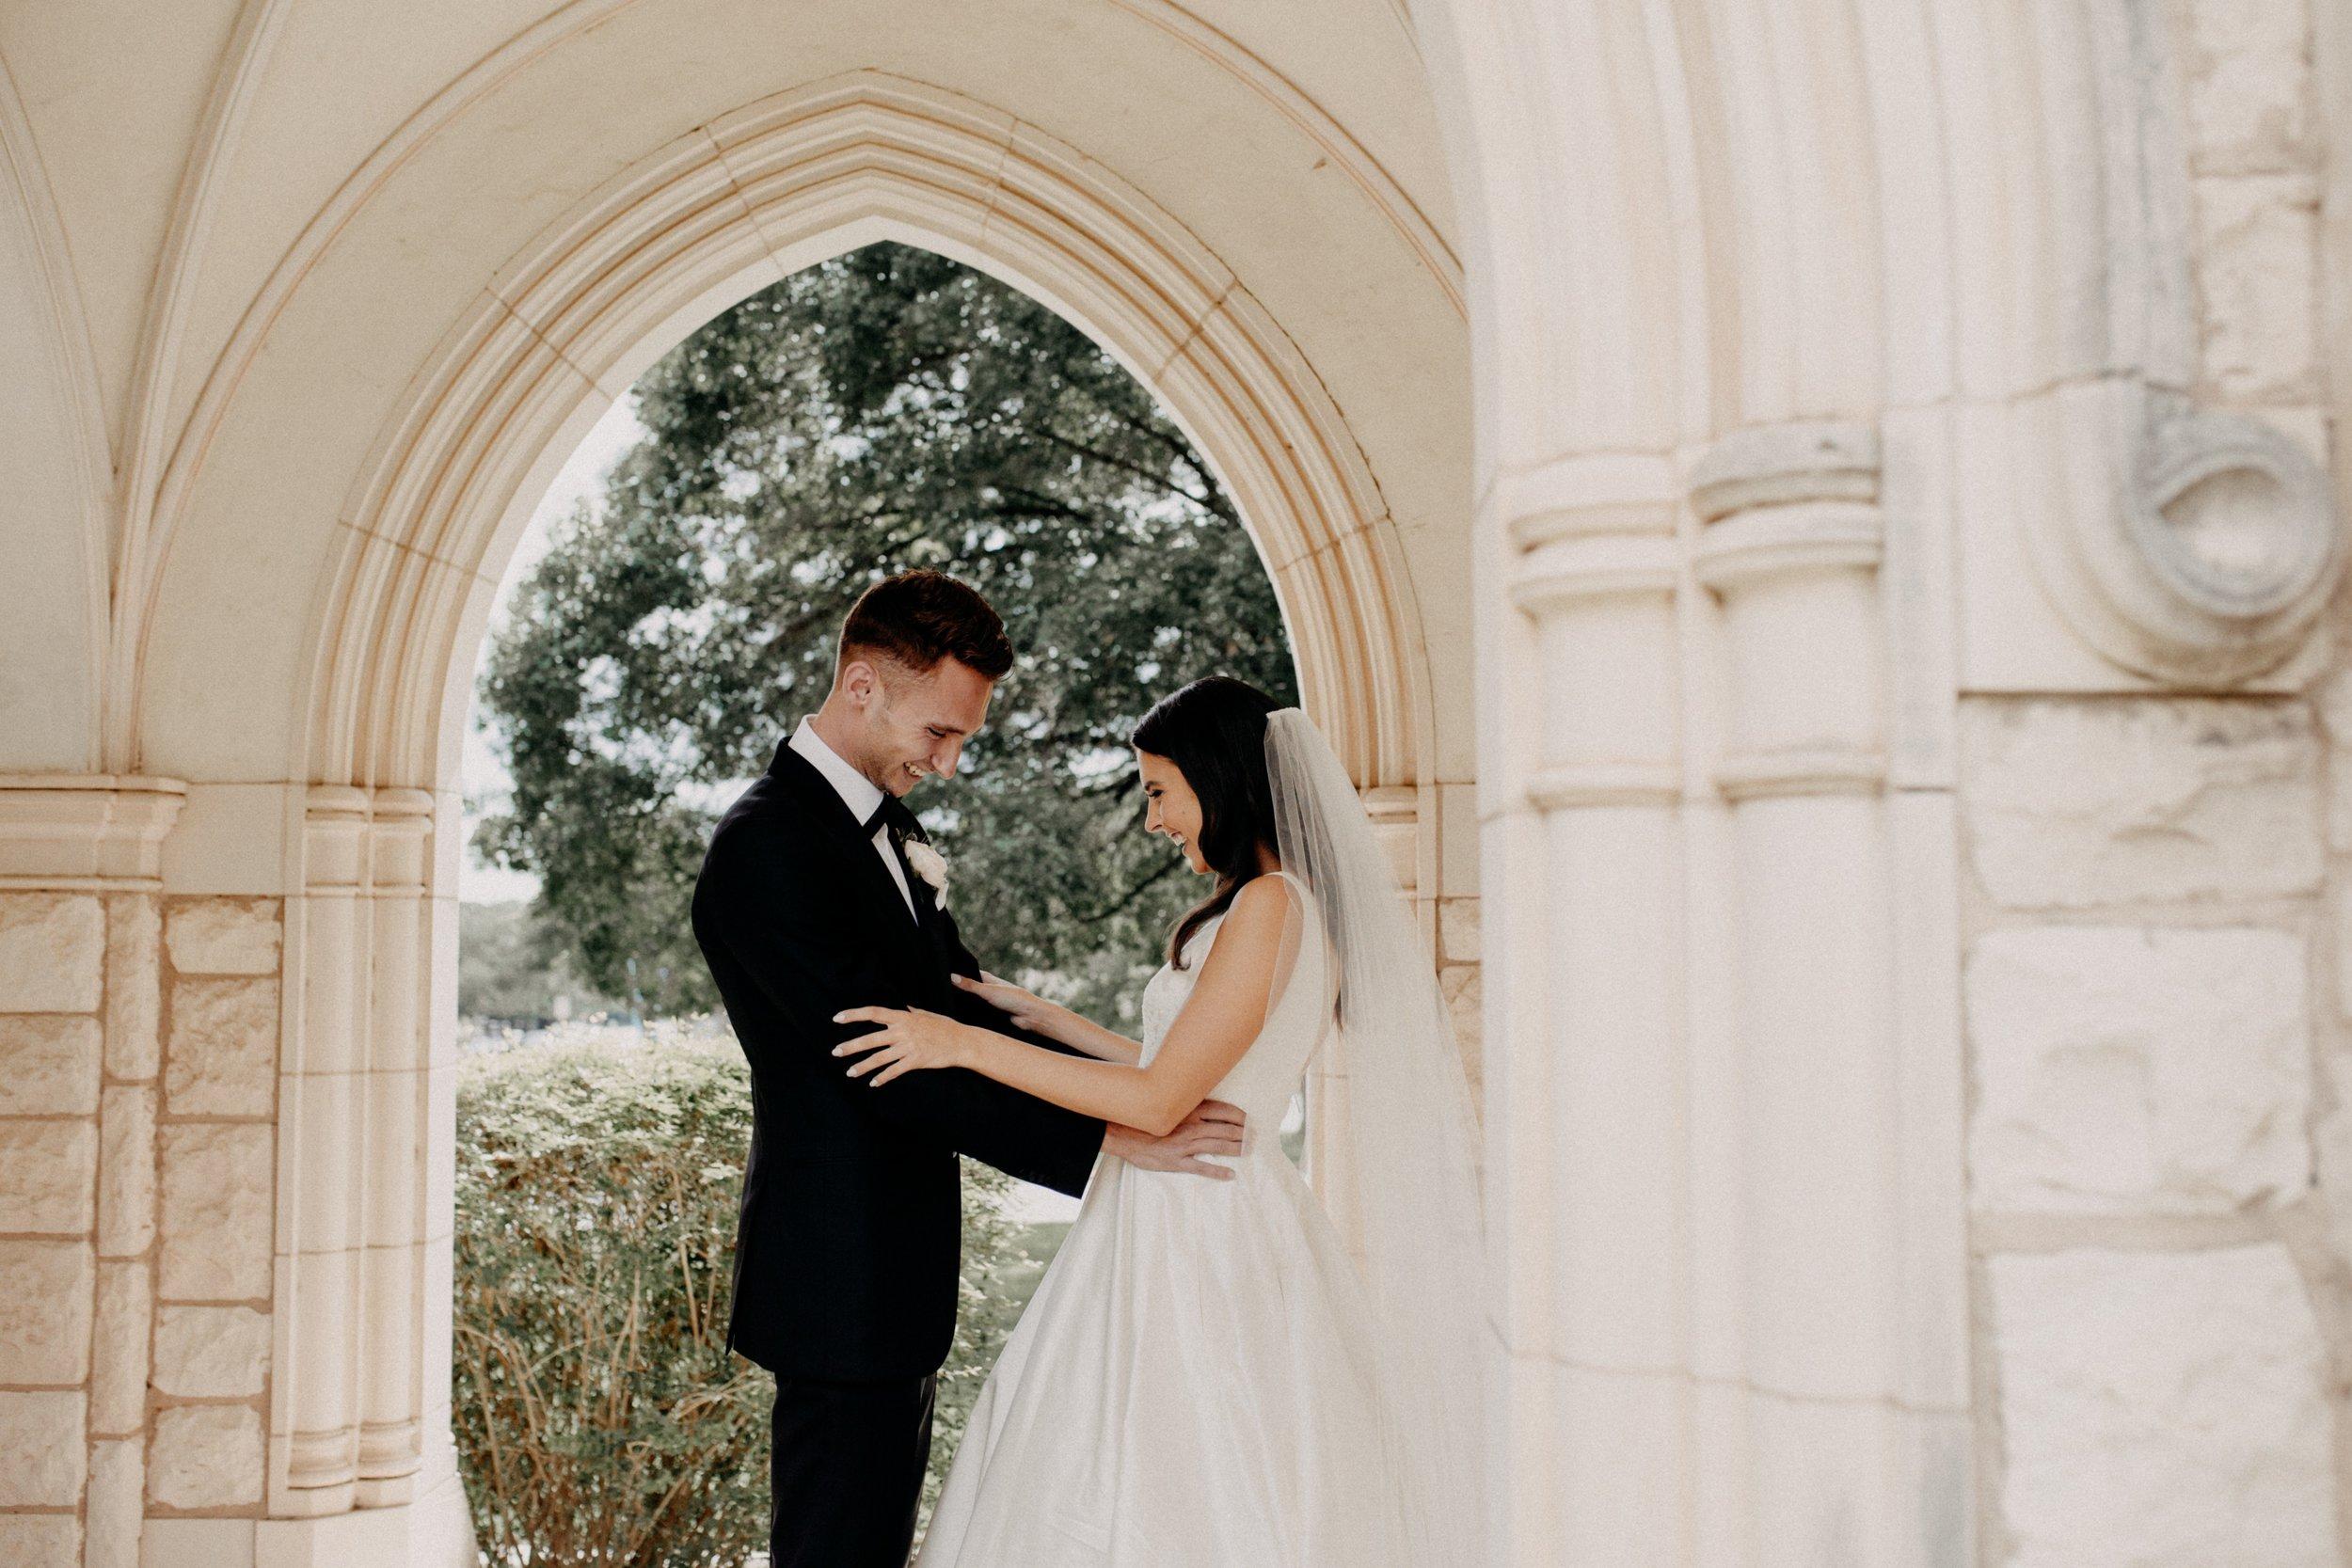 st-anthony-hotel-wedding-photography-10050san-antonio.JPG